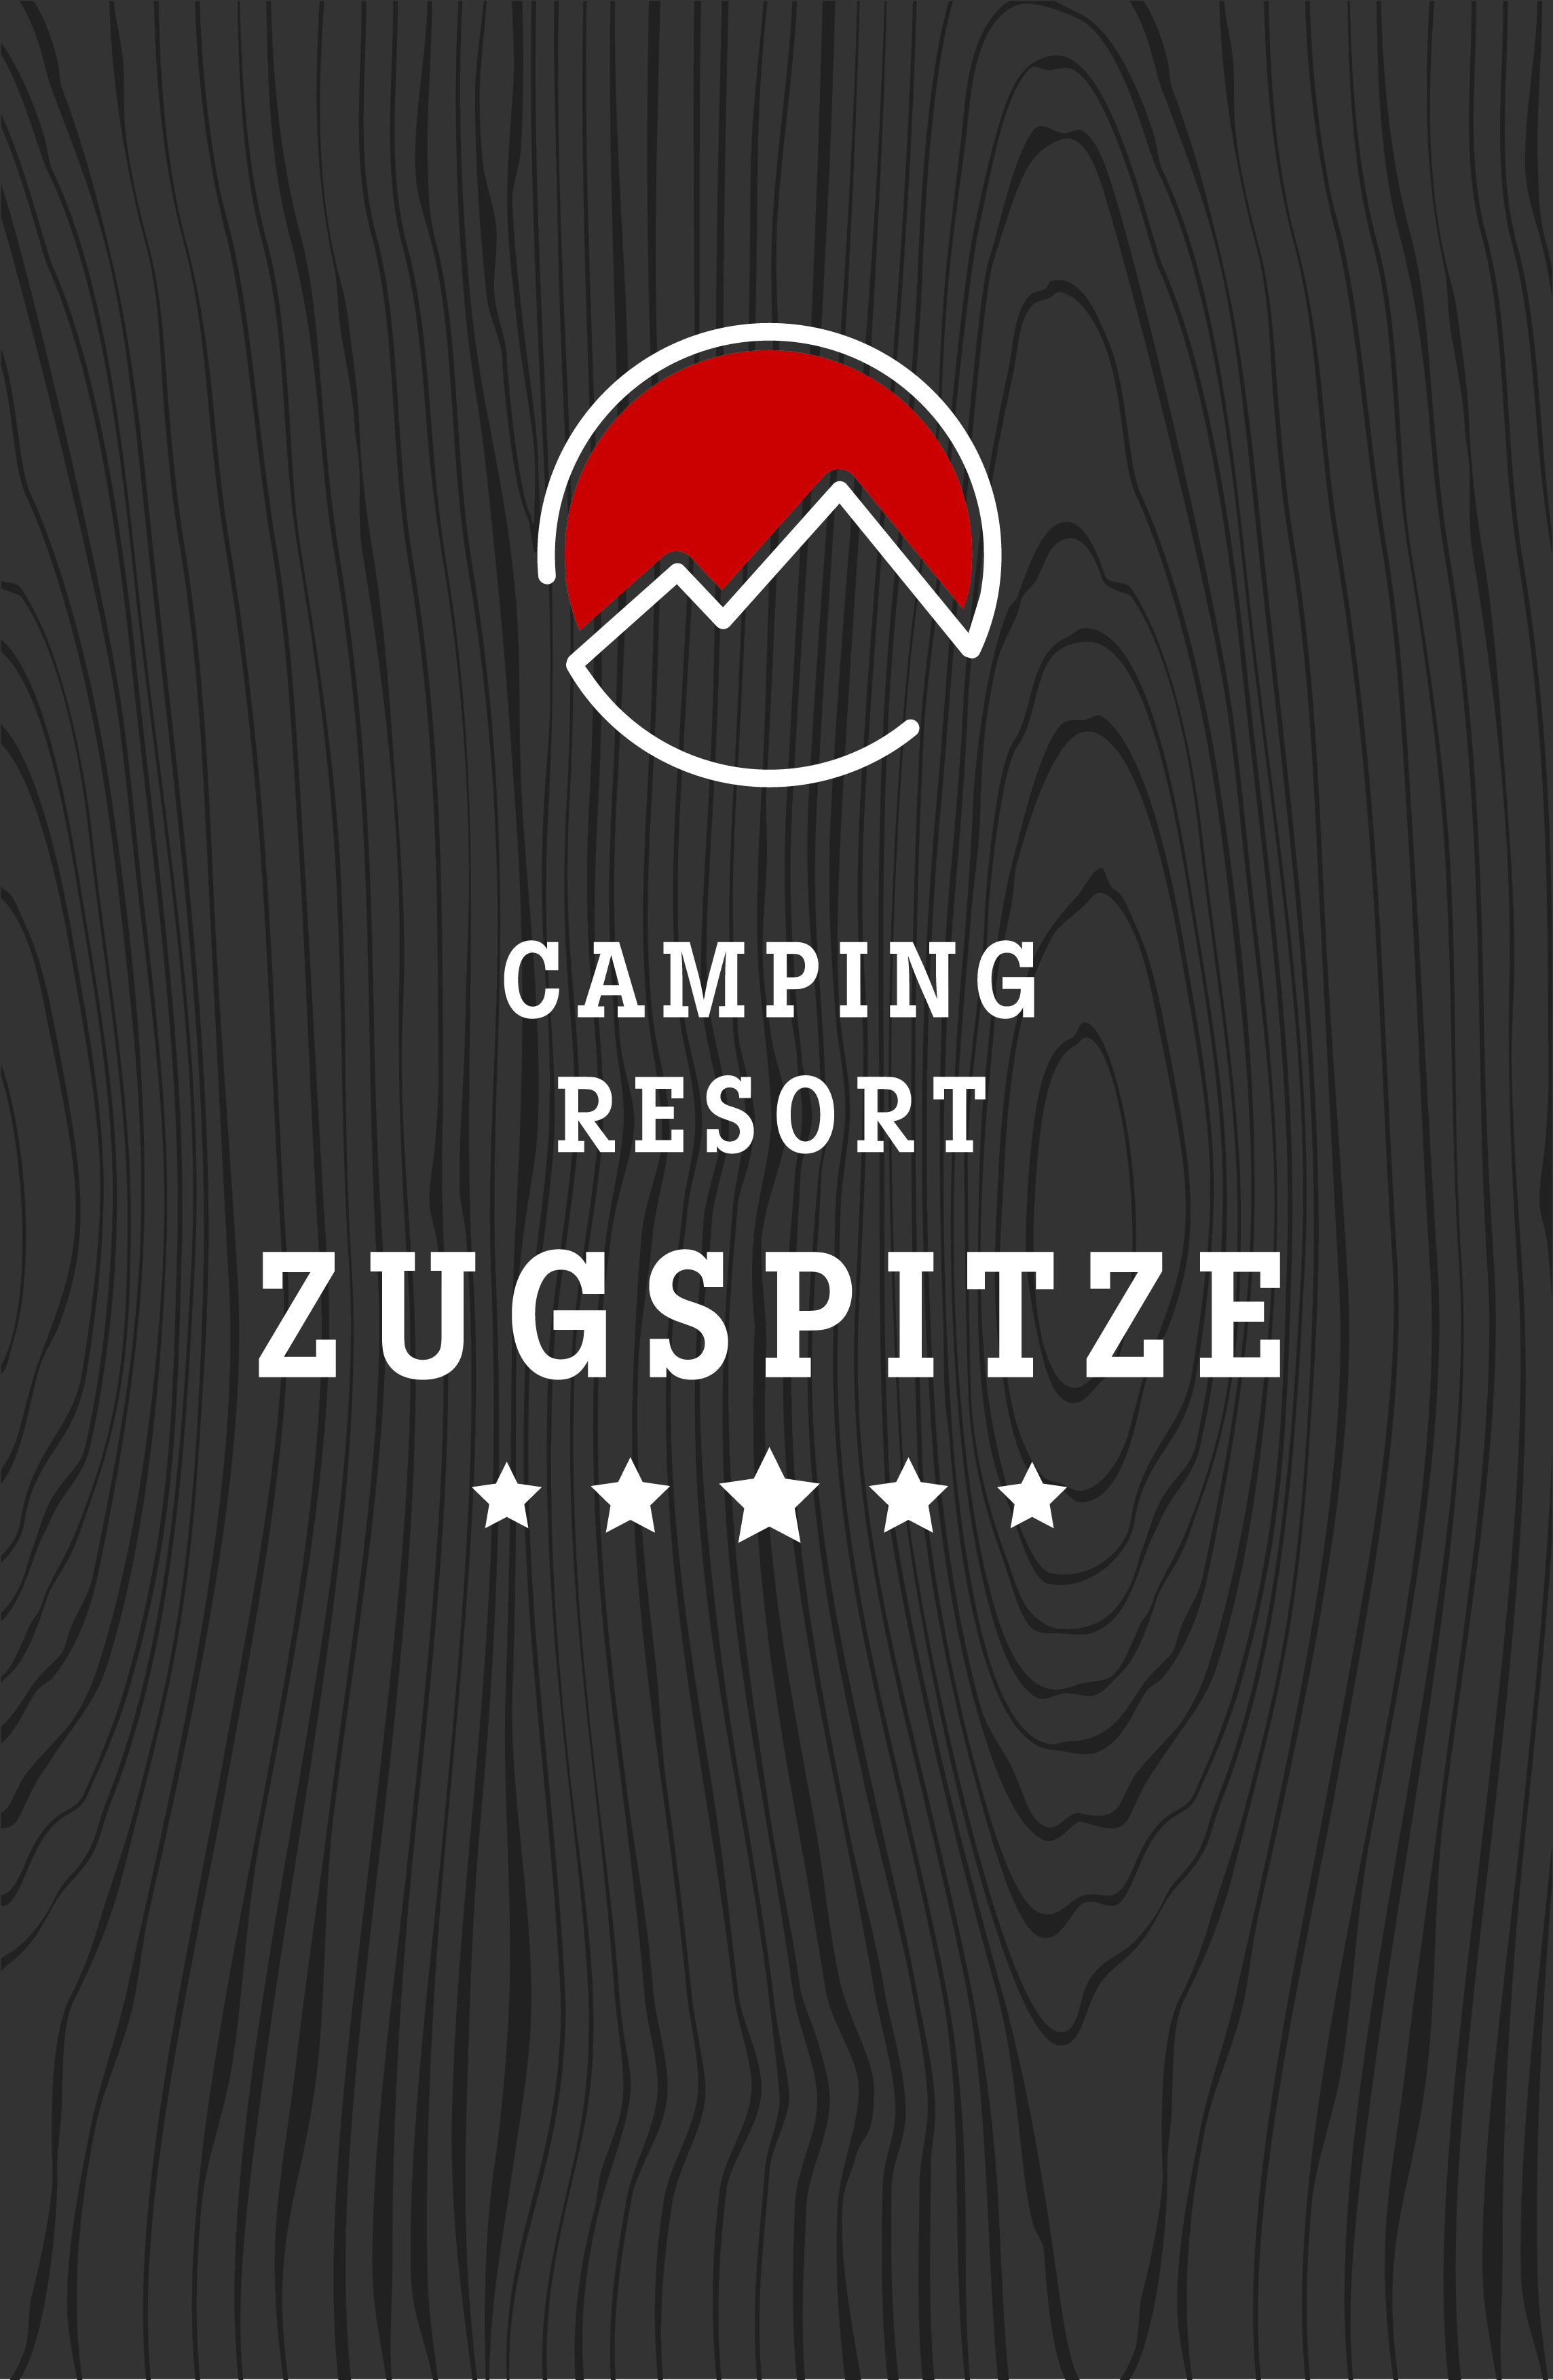 Camping Resort Zugspitze - 8. Juni